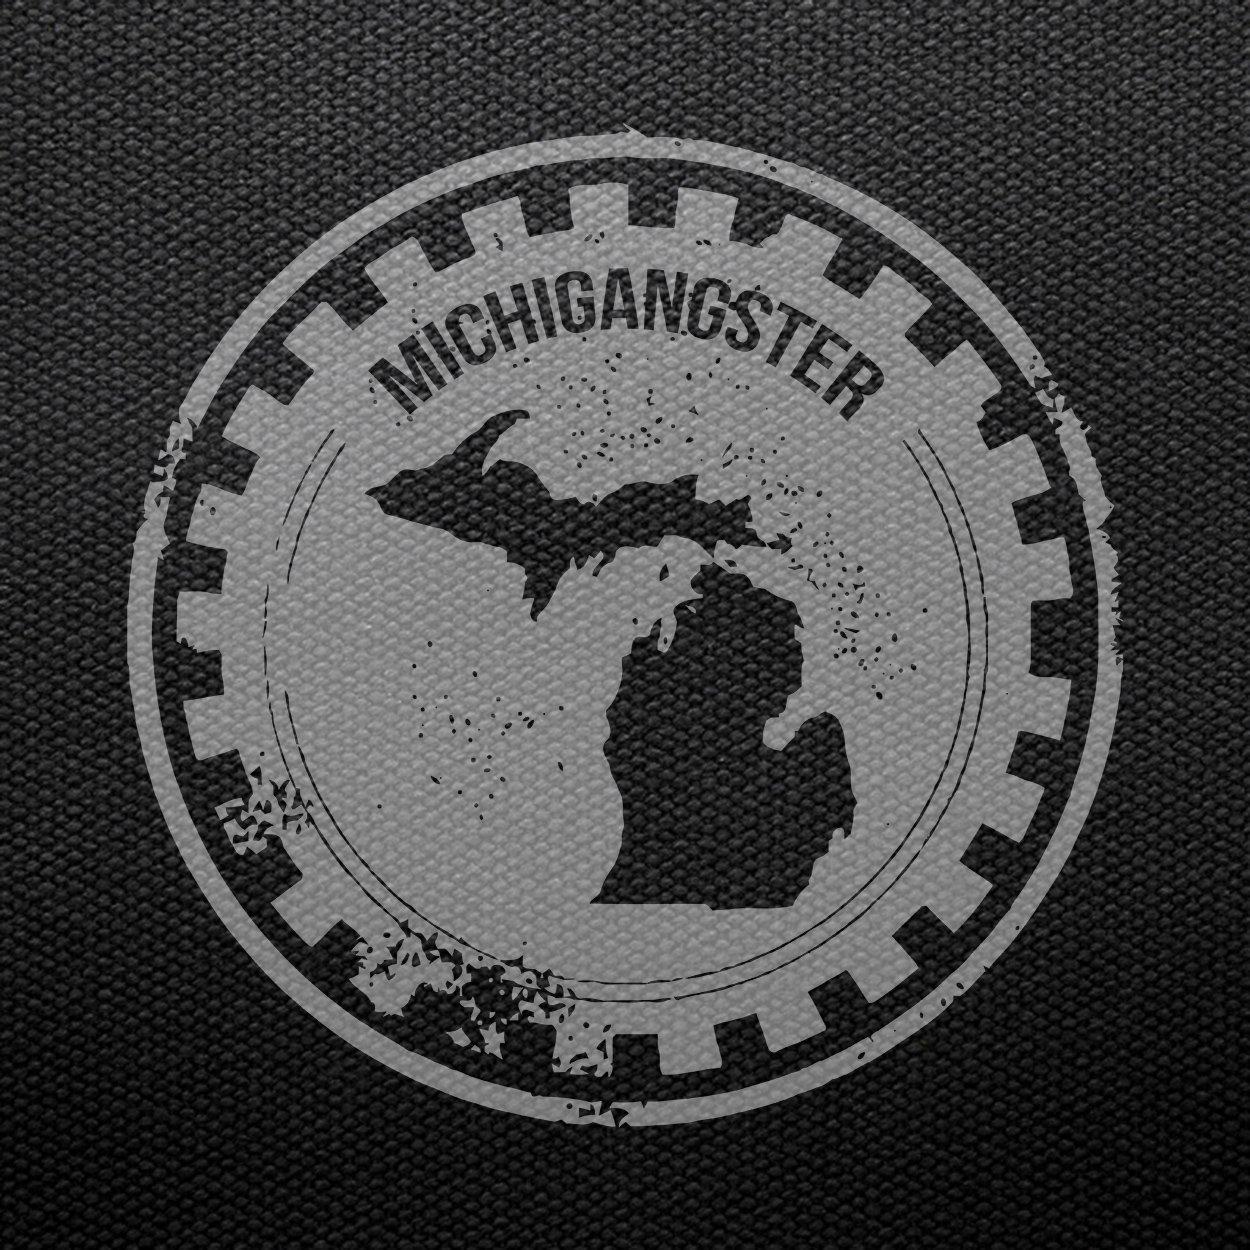 MI Home State Motor City P Tank Top Teechopchop Detroit Michigan Michigangster